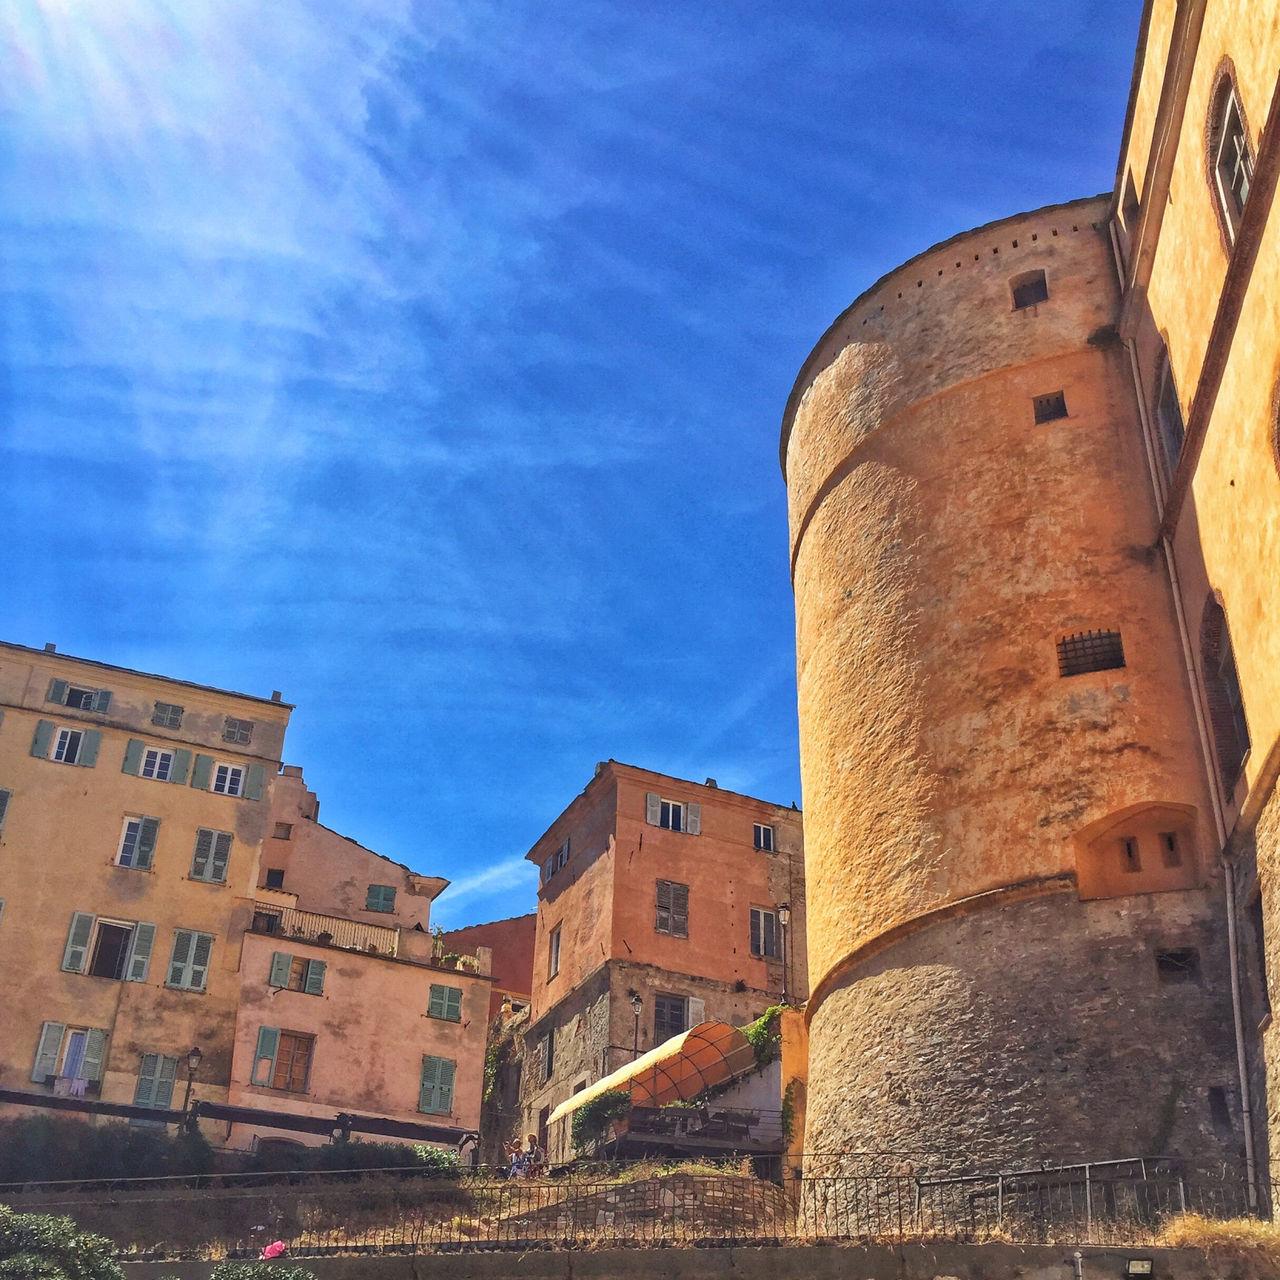 The citadel in Bastia, Corsica. Taken mid summer 2016 Architecture Bastia Blue Building Exterior Cita Corsica Outdoors Sky Summer Sunlight